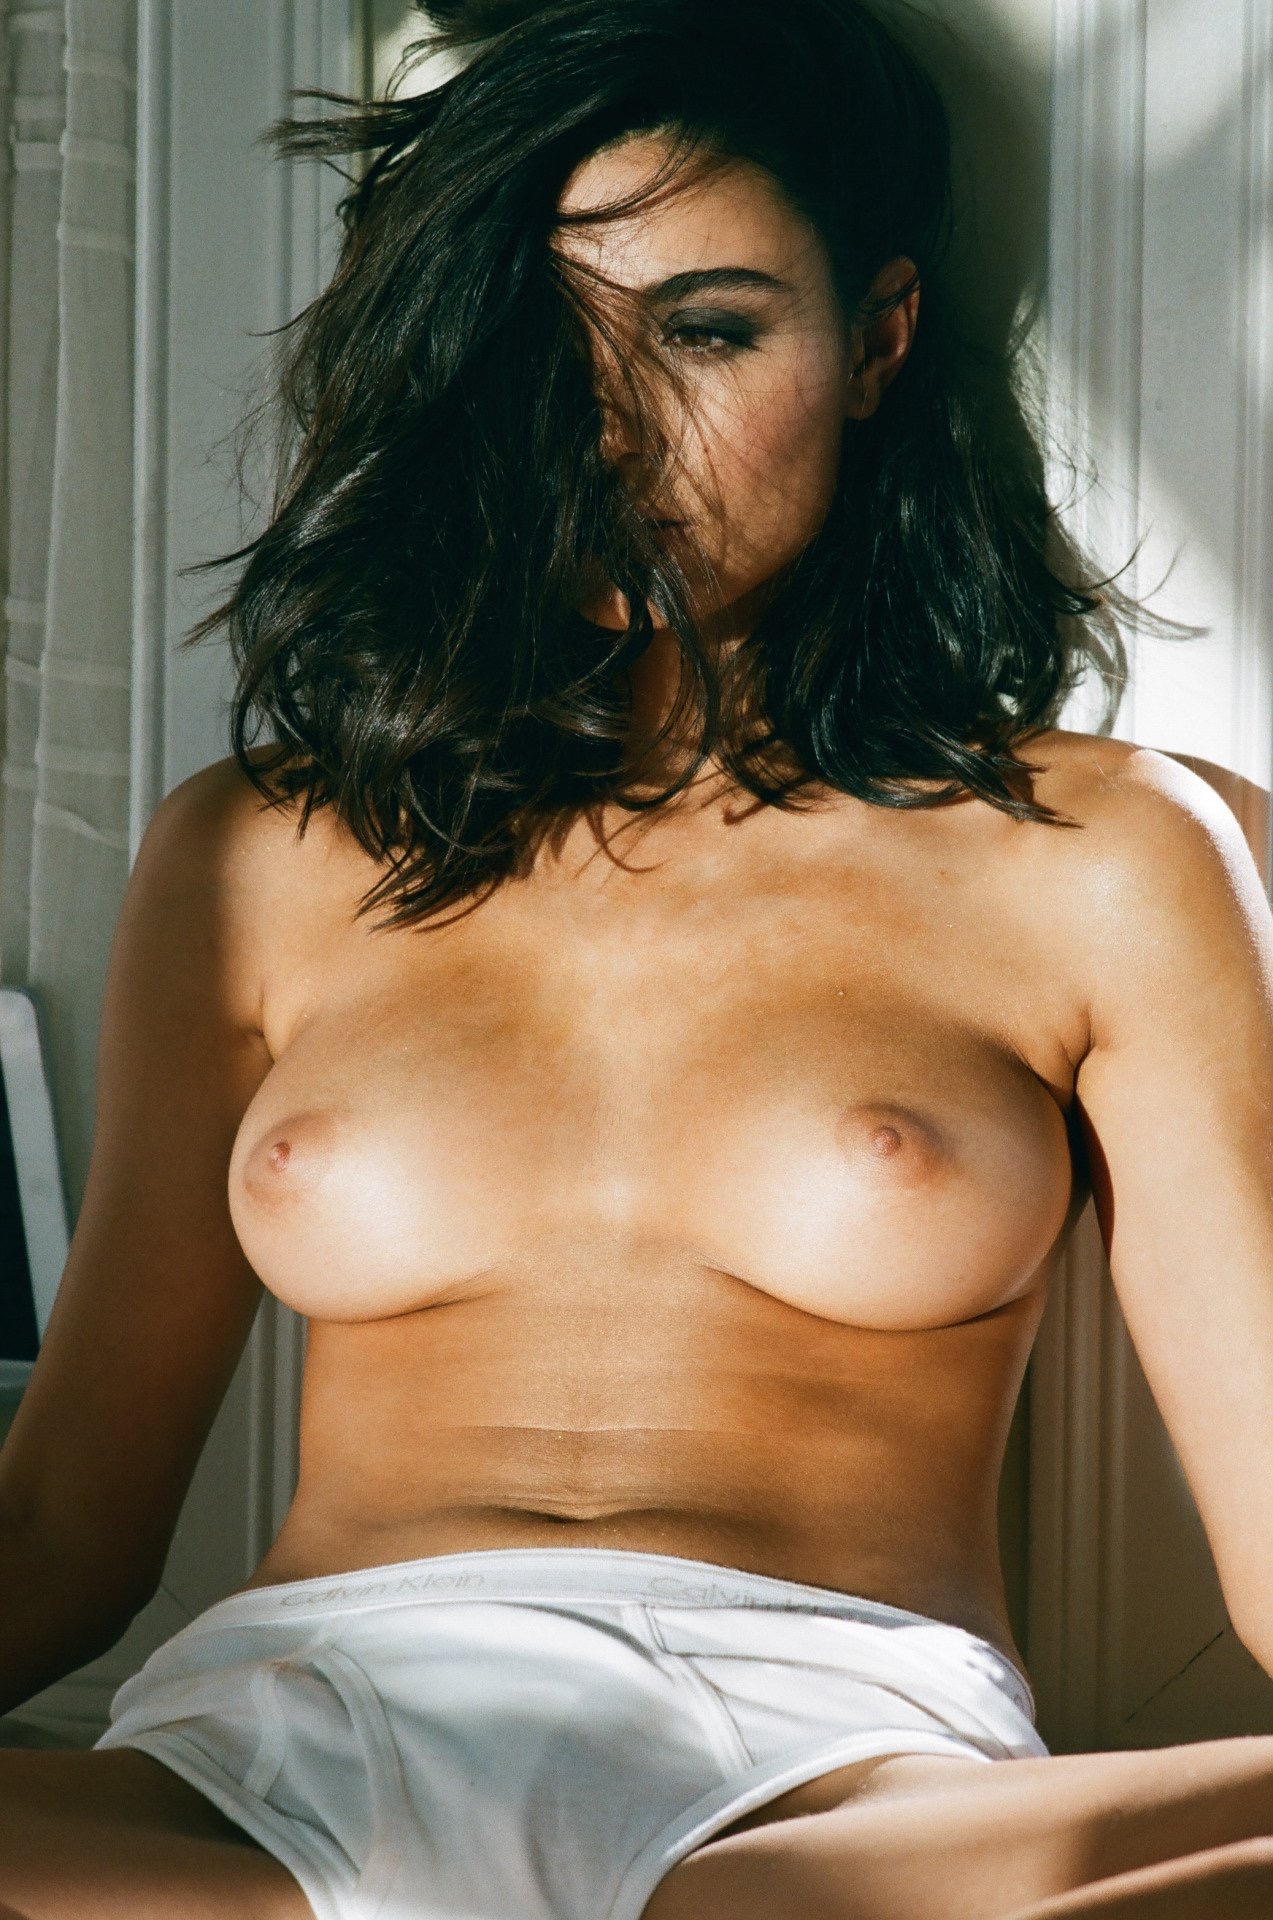 Eva lavrue sexy nipples — pic 9